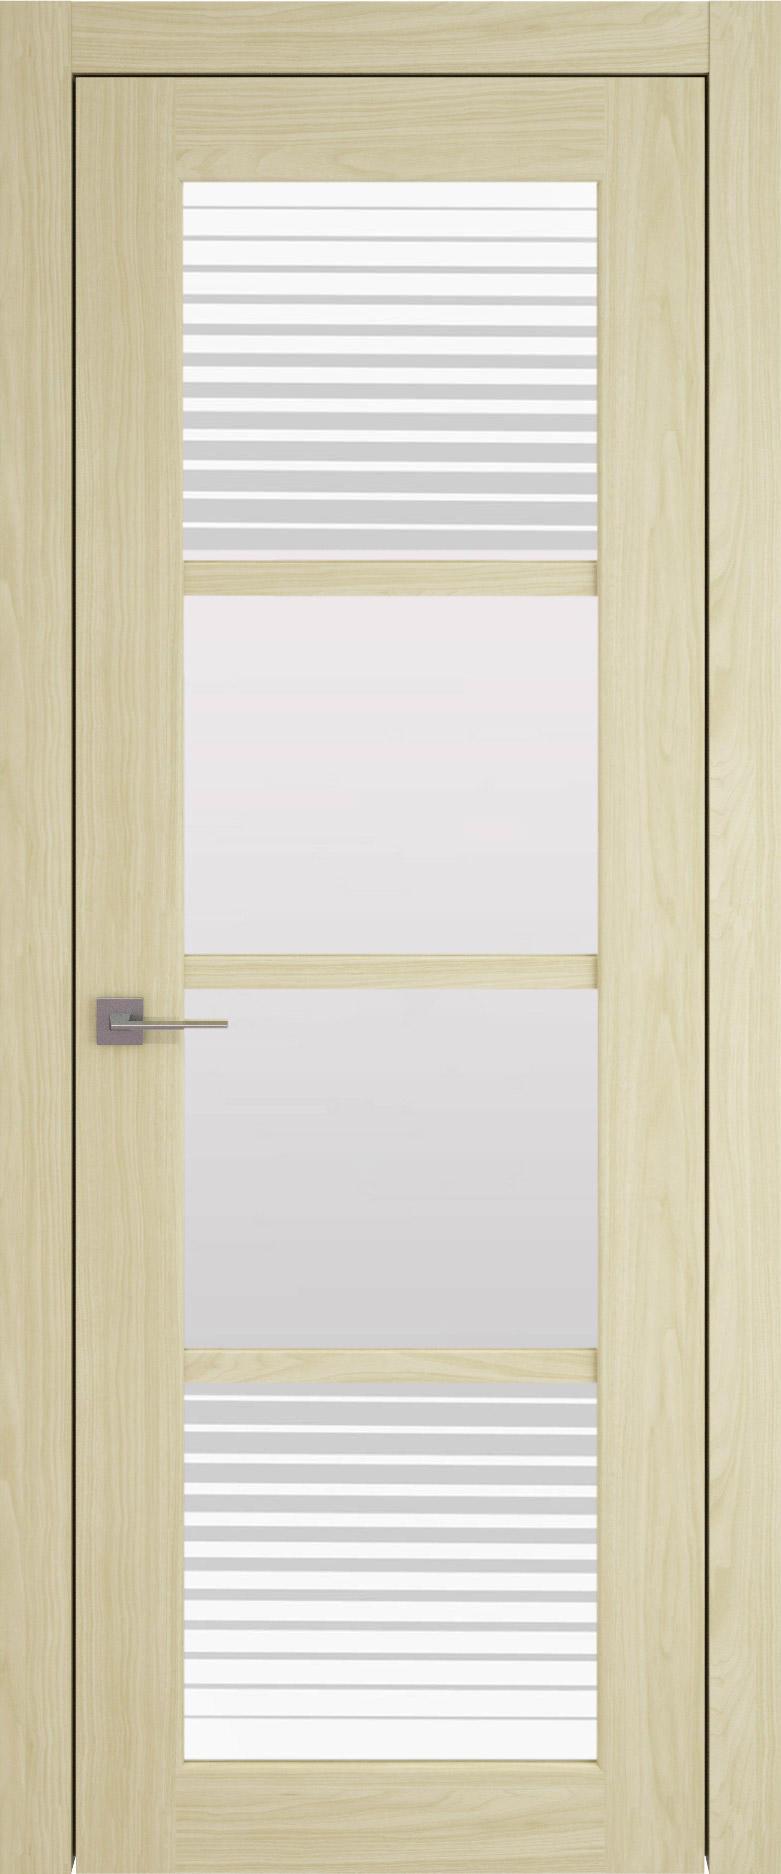 Felicia цвет - Дуб нордик Со стеклом (ДО)